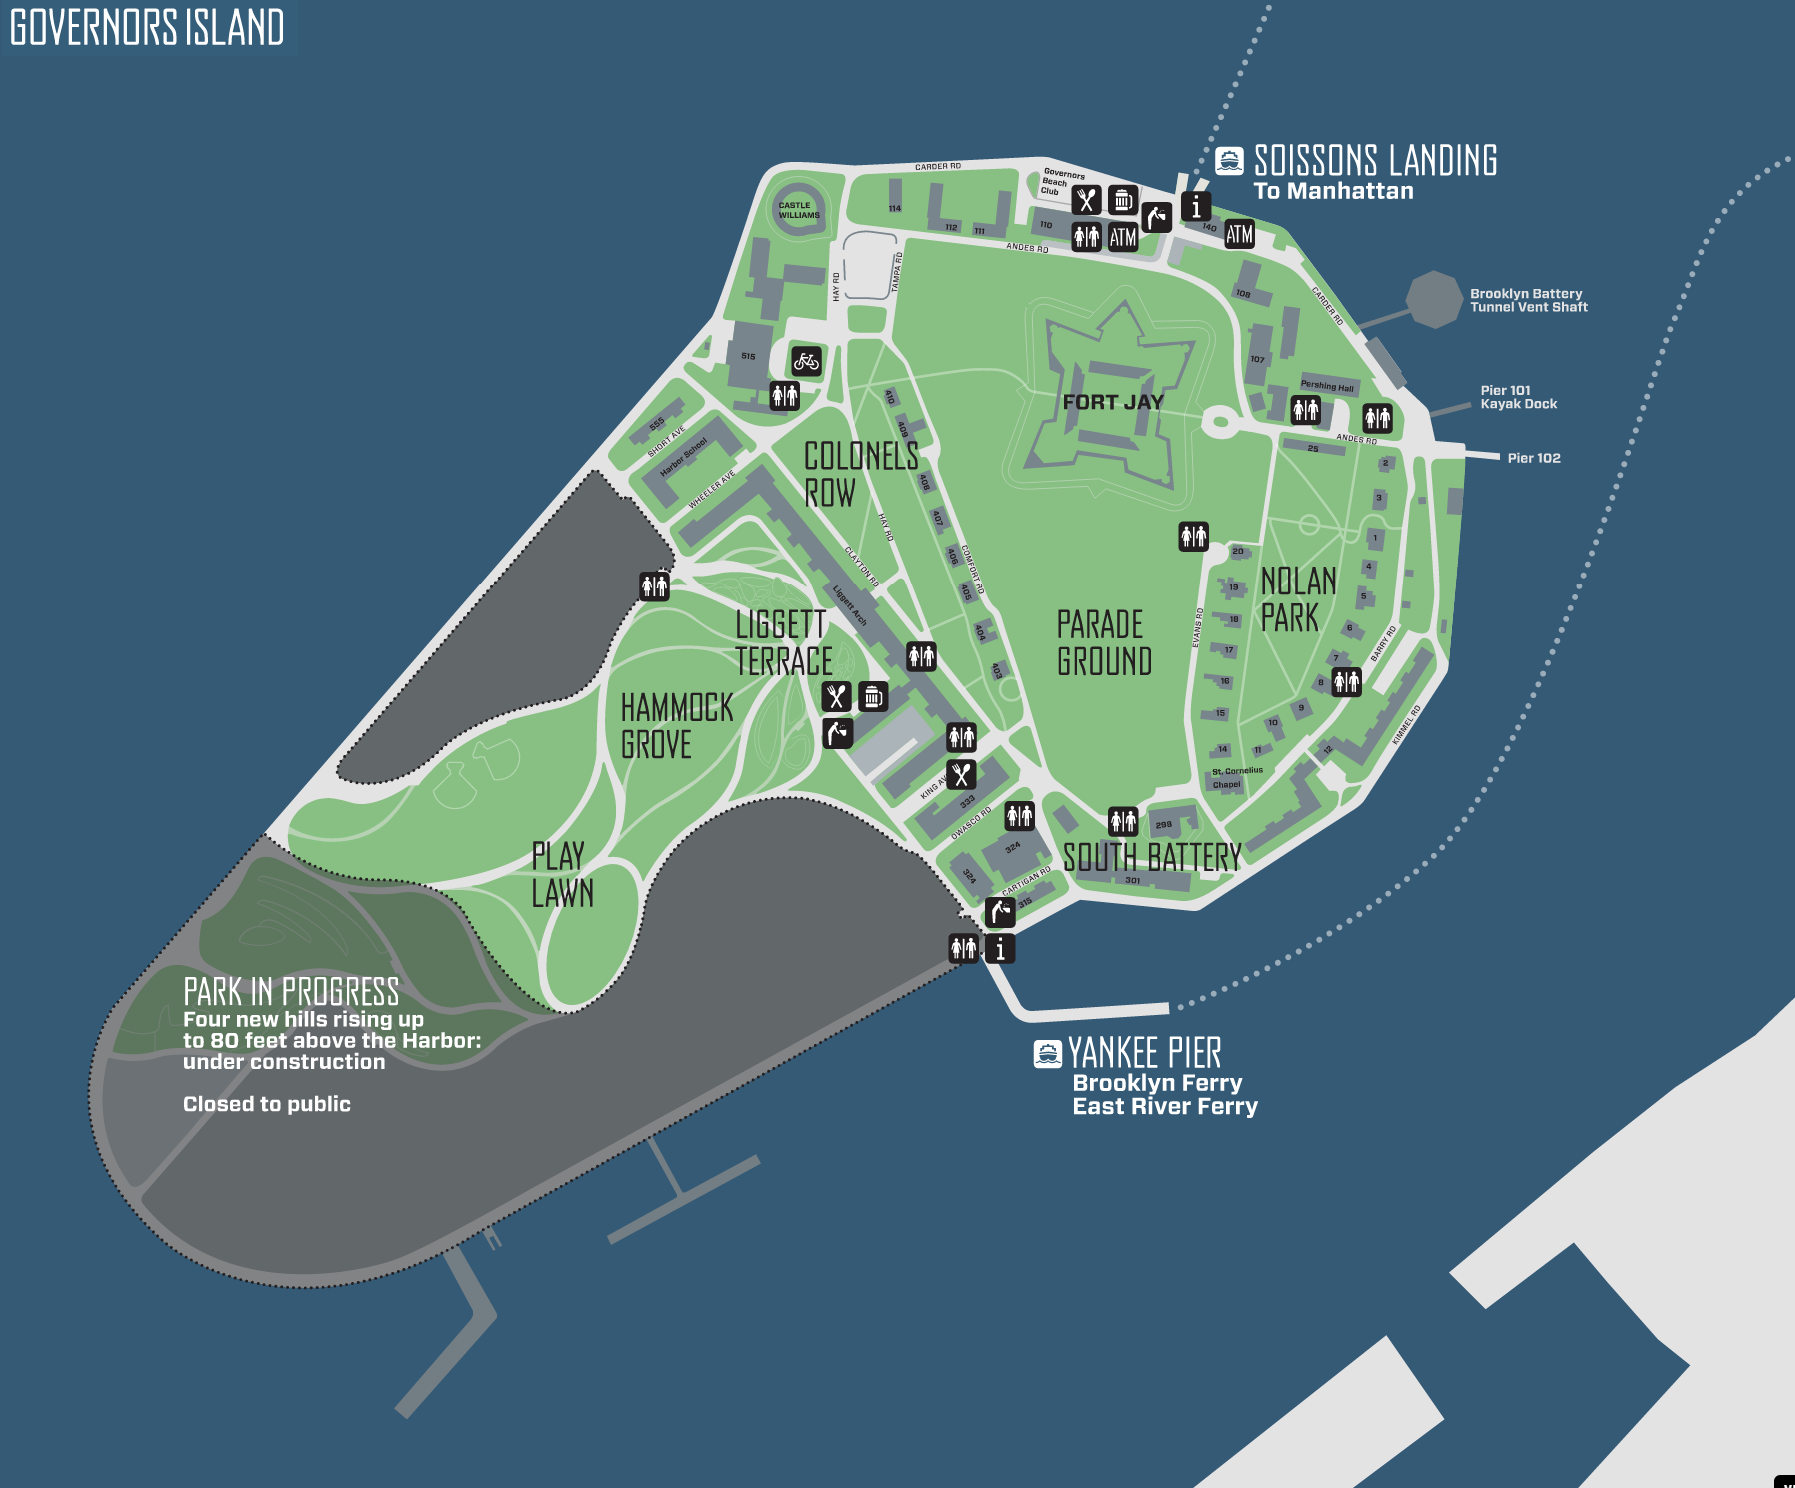 Governors Island Bike Map NYC Bike Maps